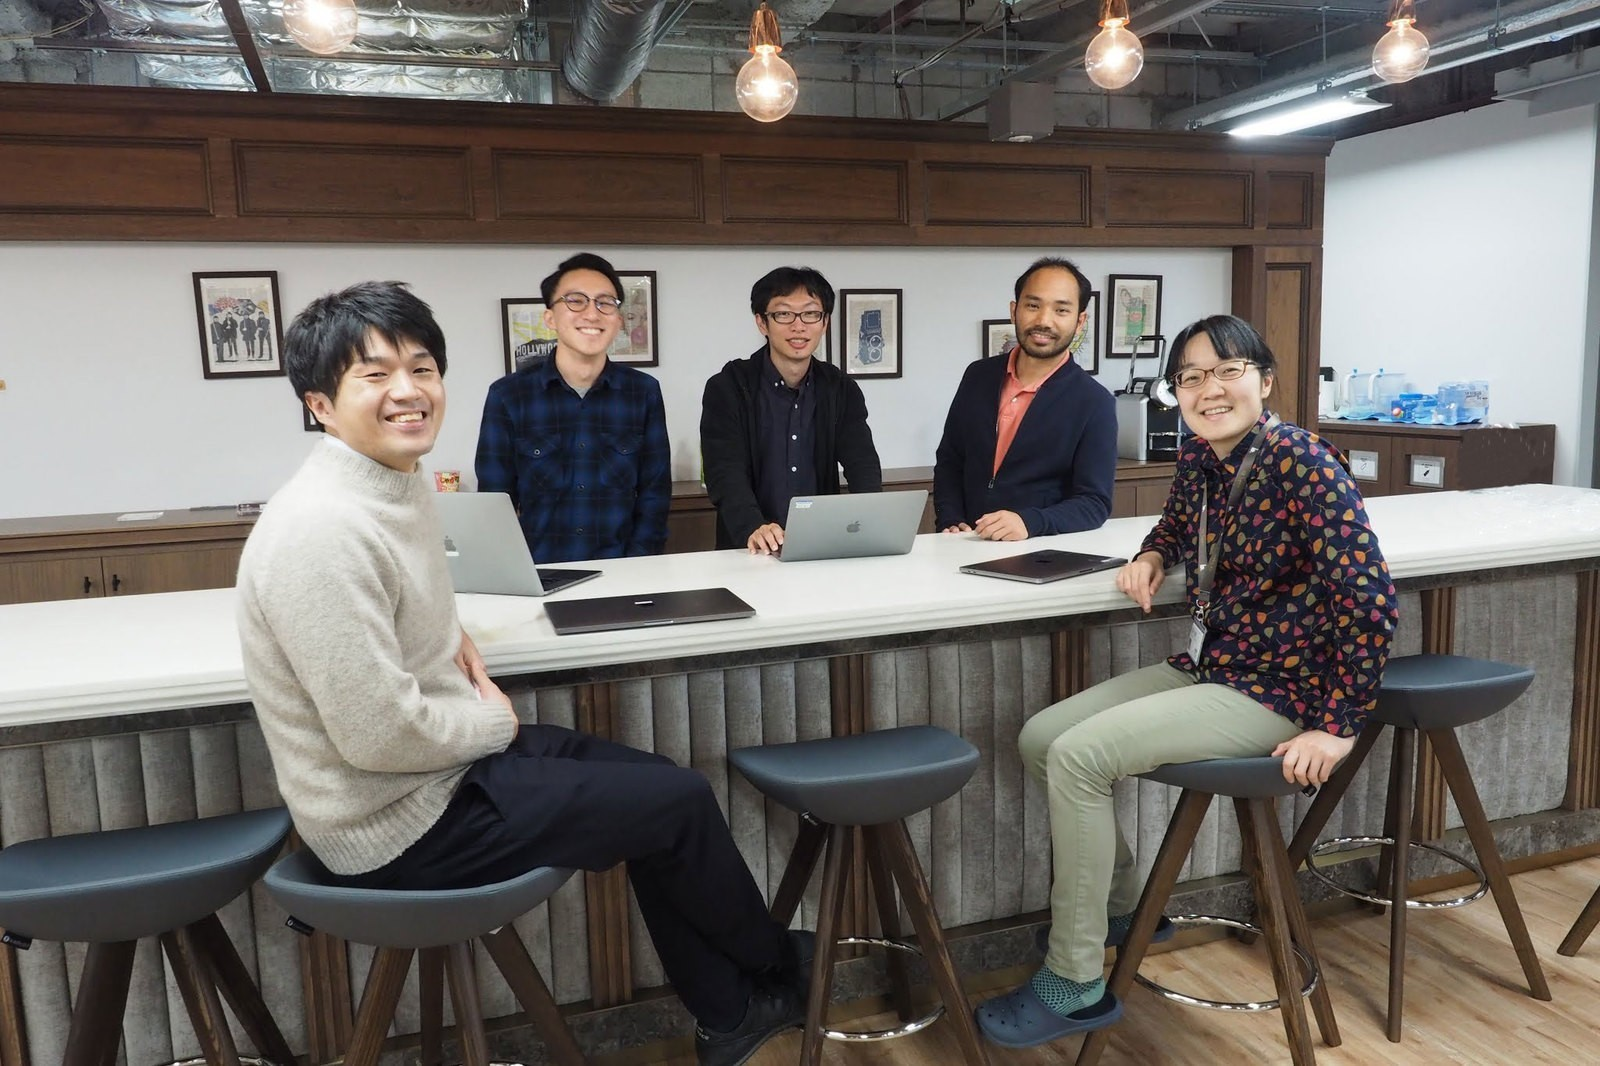 AI技術を取り入れたプロダクトの開発を支援するMachine Learning Engineer を募集!